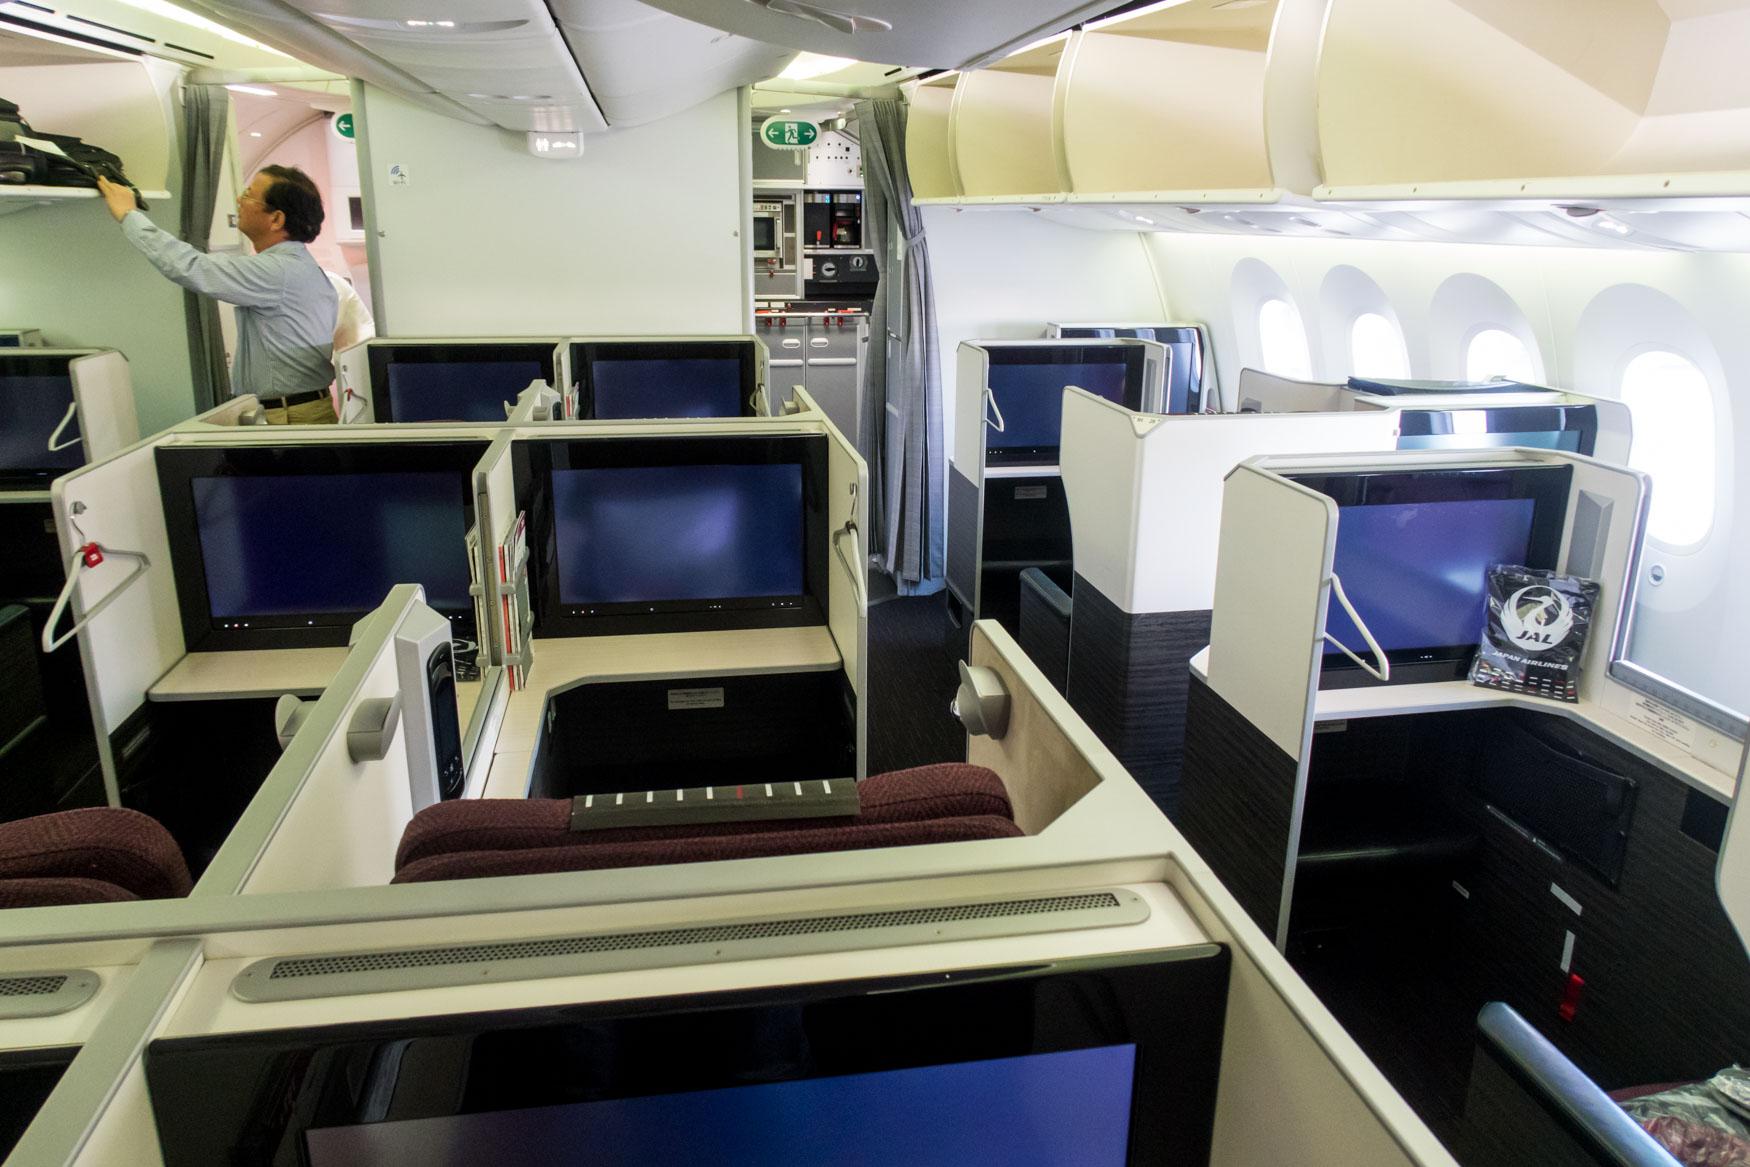 Japan Airlines Apex Suites Business Class Cabin